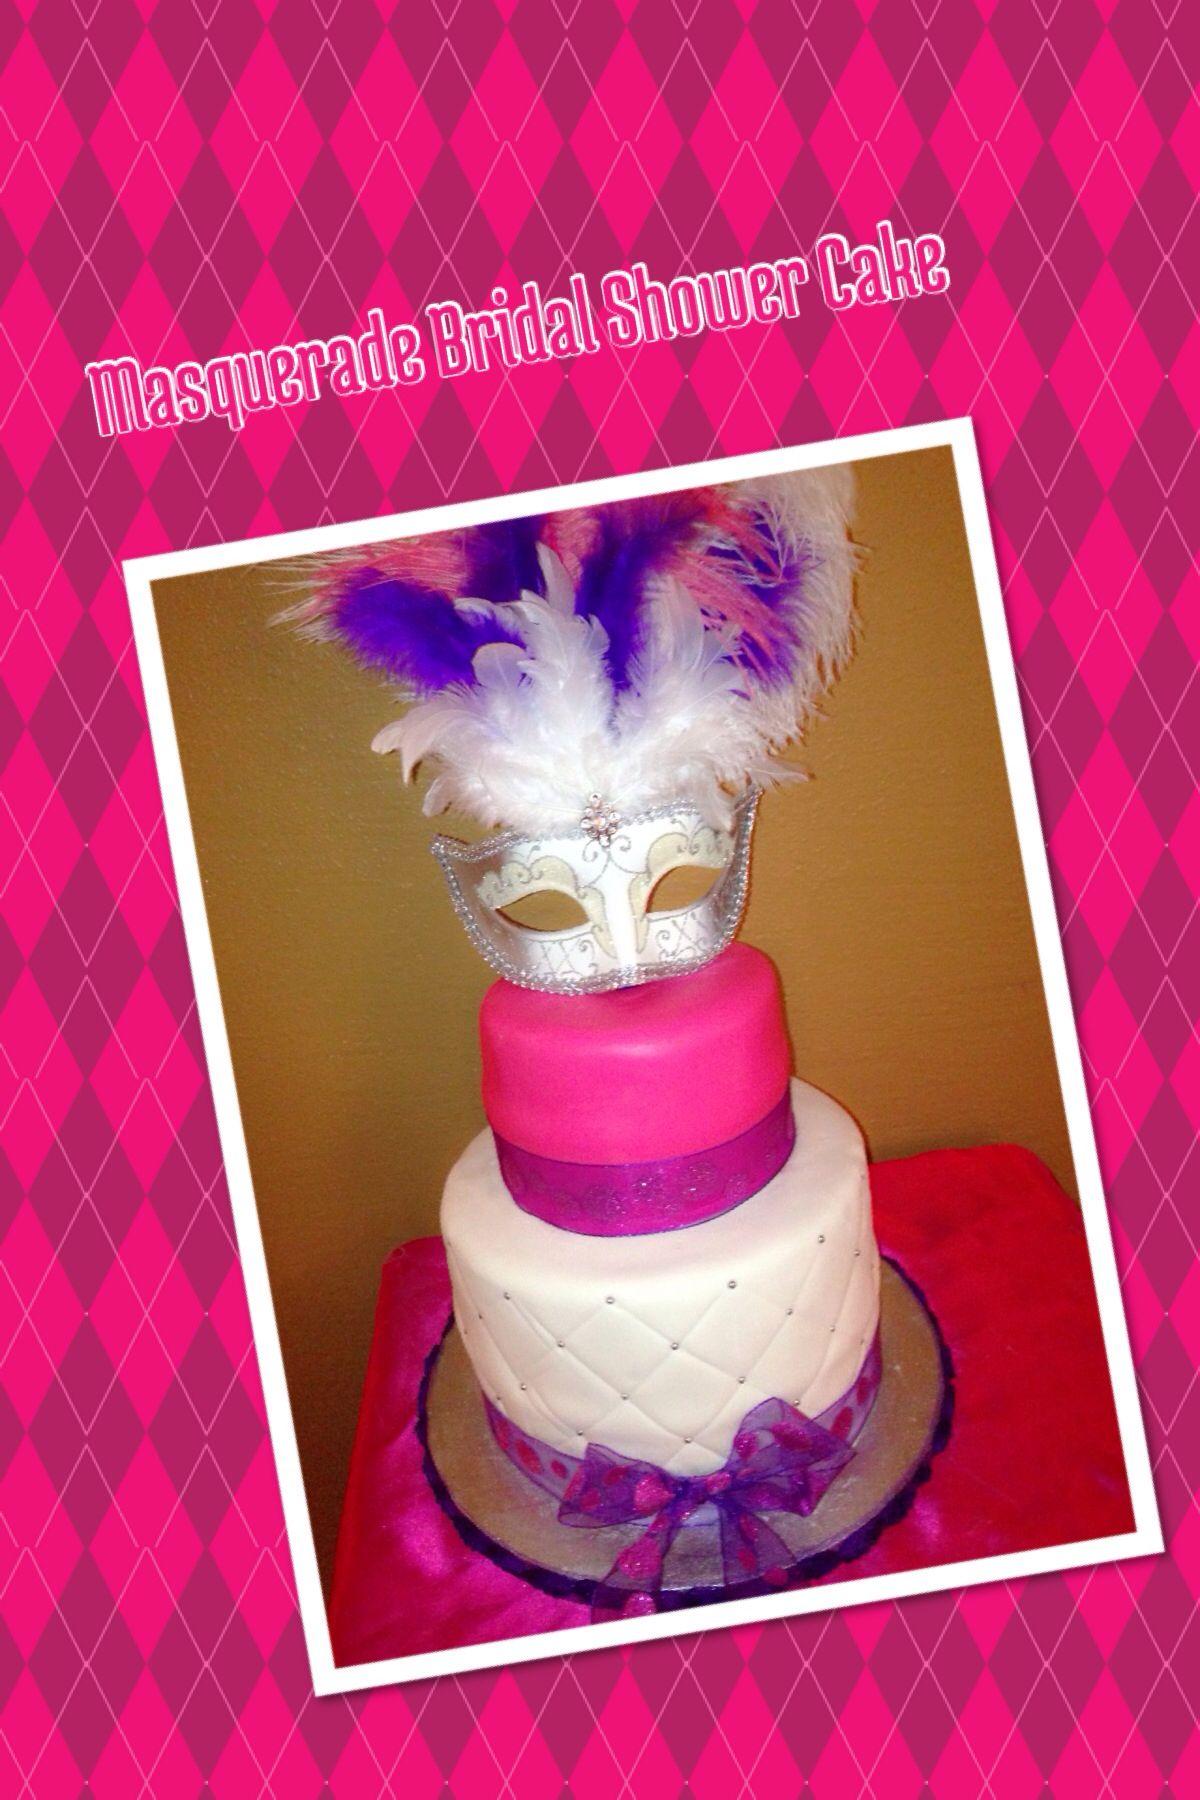 masquerade bridal shower cake bridal shower pinterest bridal shower cakes shower cakes and cake jpg 1200x1800